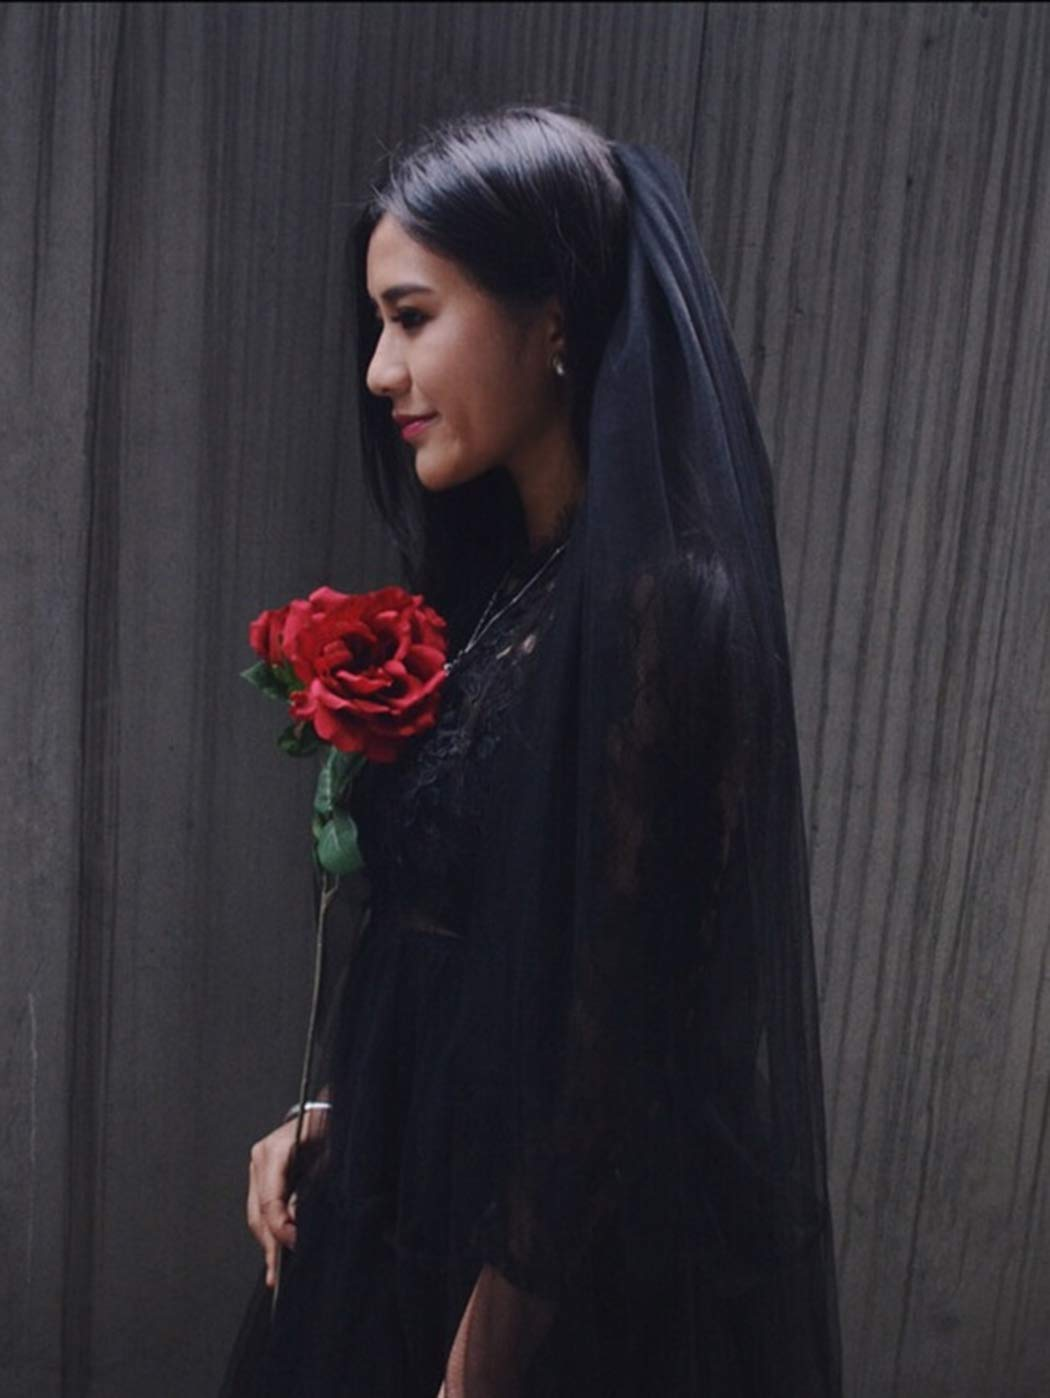 Clairy Bride Wedding Veil 2 Tier Bride Veils Bridal Tulle Headpieces Long Hair Jewelry Veils with Comb (Black)